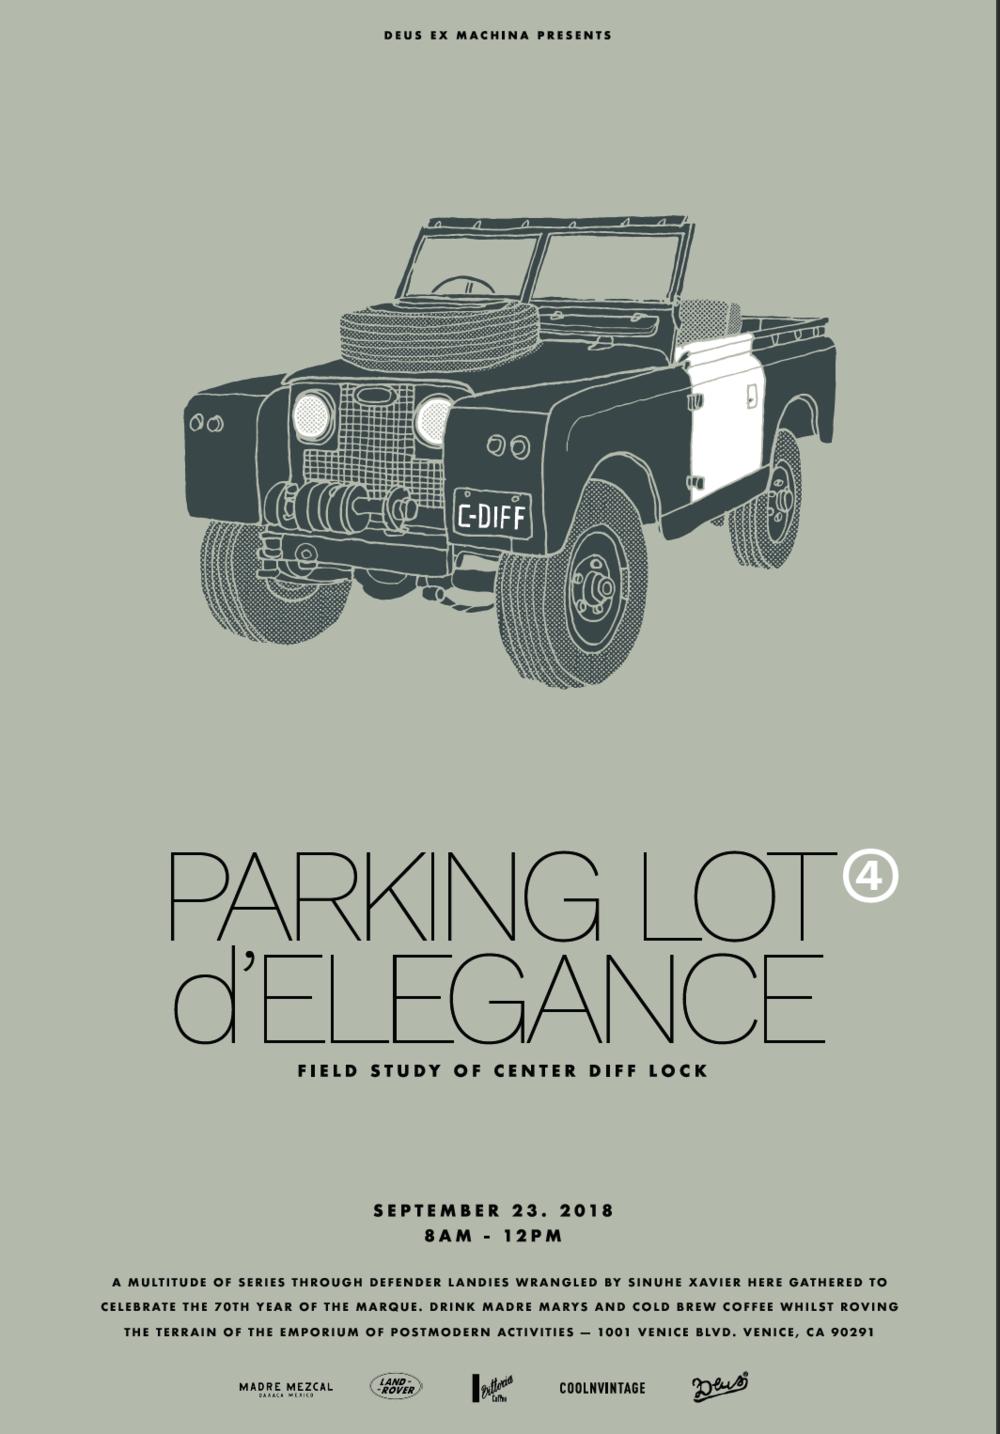 Parking Lot D'Elegance | Deus Ex Machina